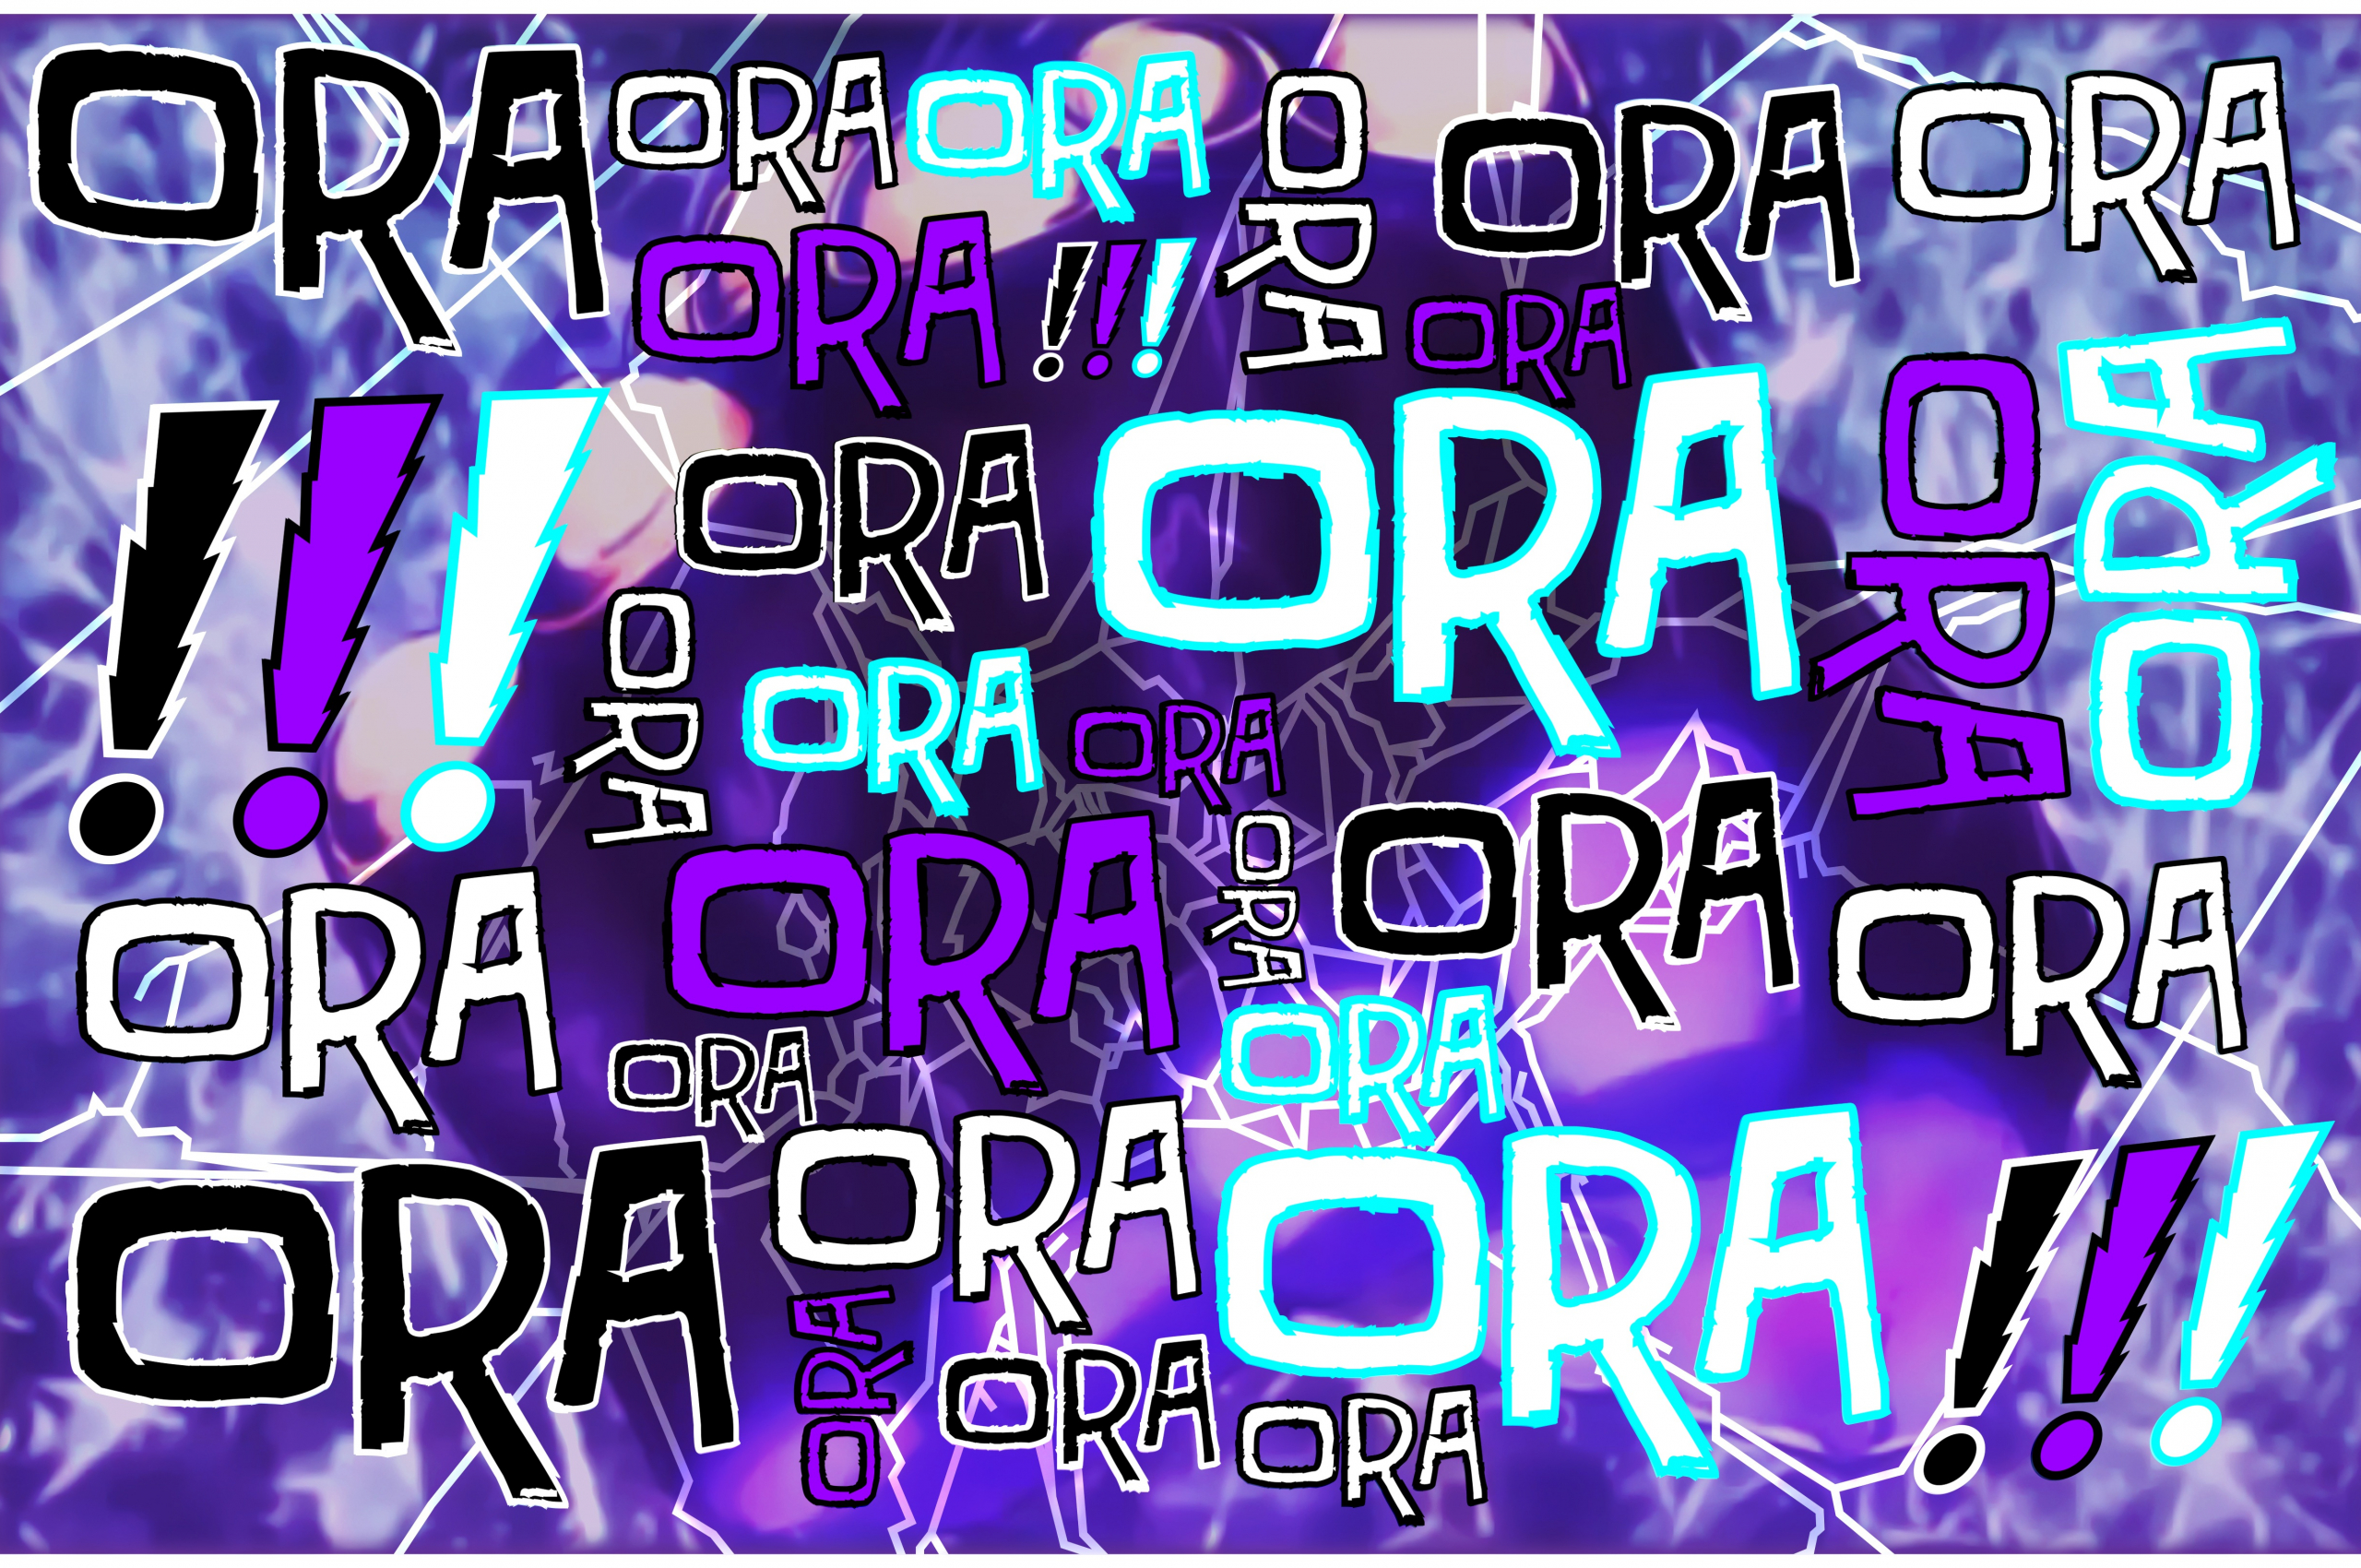 Free Download Jojos Bizarre Adventure 4k Ultra Hd Wallpaper Background Image 5000x3246 For Your Desktop Mobile Tablet Explore 45 Jojo Background Jojo Wallpaper Wallpaper Jojo Jojo Background